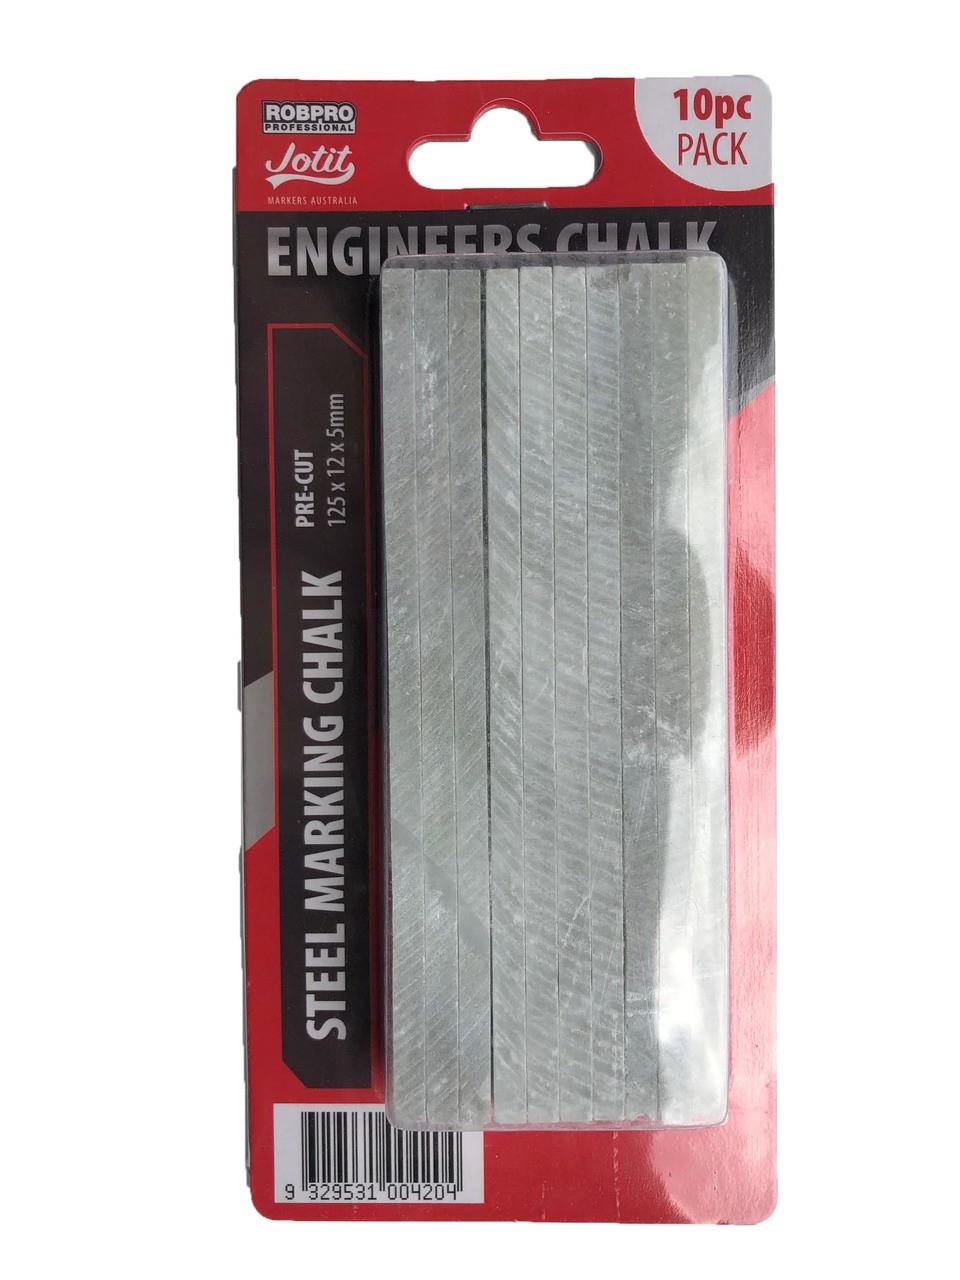 Engineers chalk 10pc pack